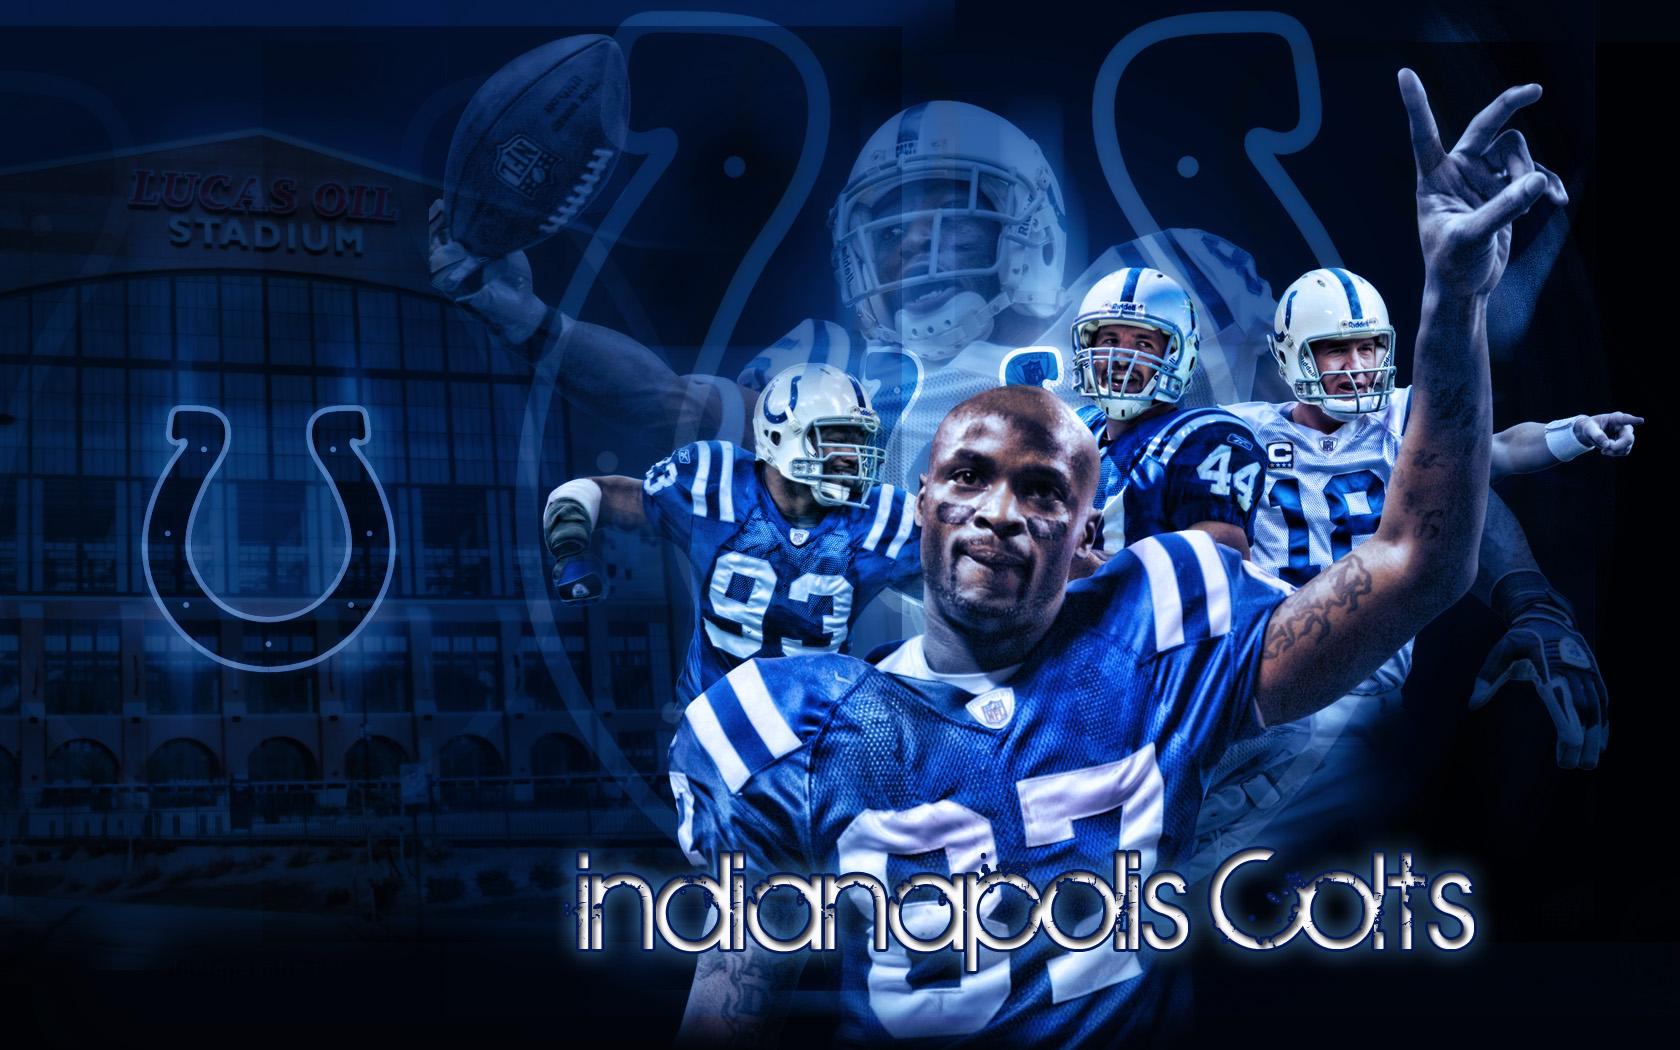 Indianapolis Colts Wallpaper Screensavers - WallpaperSafari